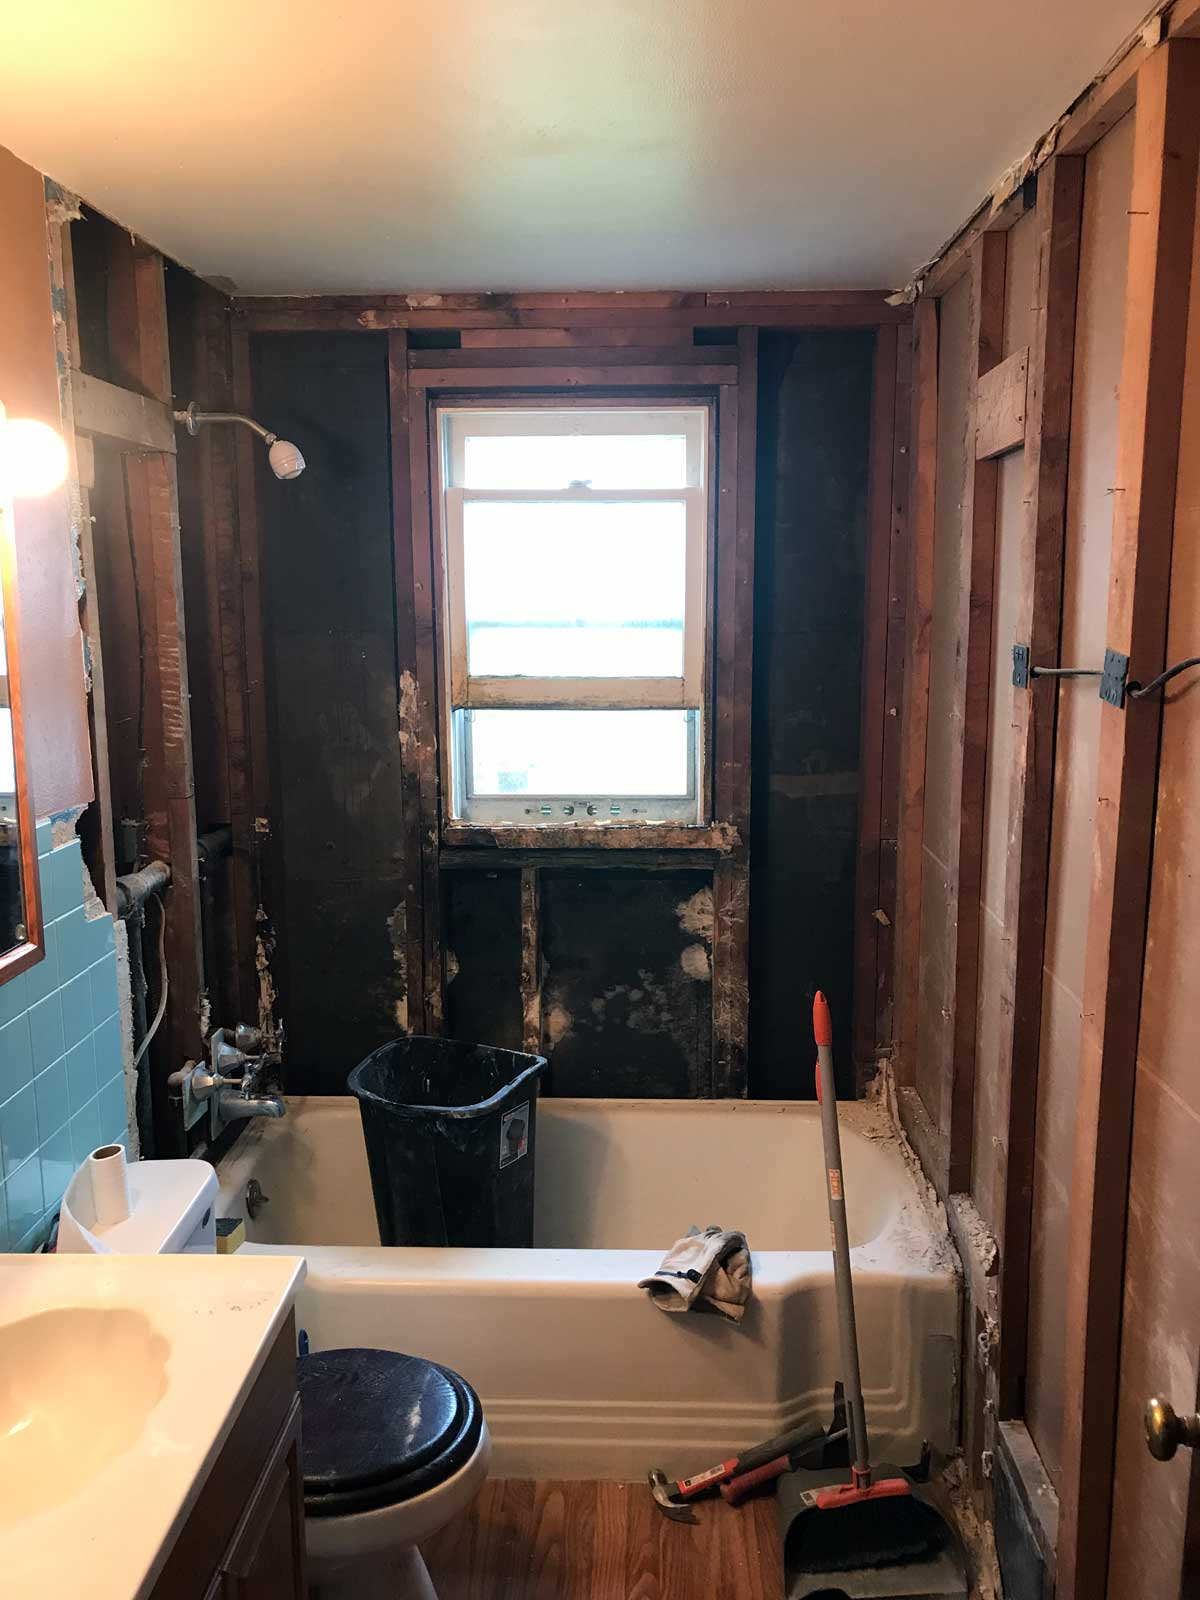 15 Day Bathroom Renovation Demolition 02